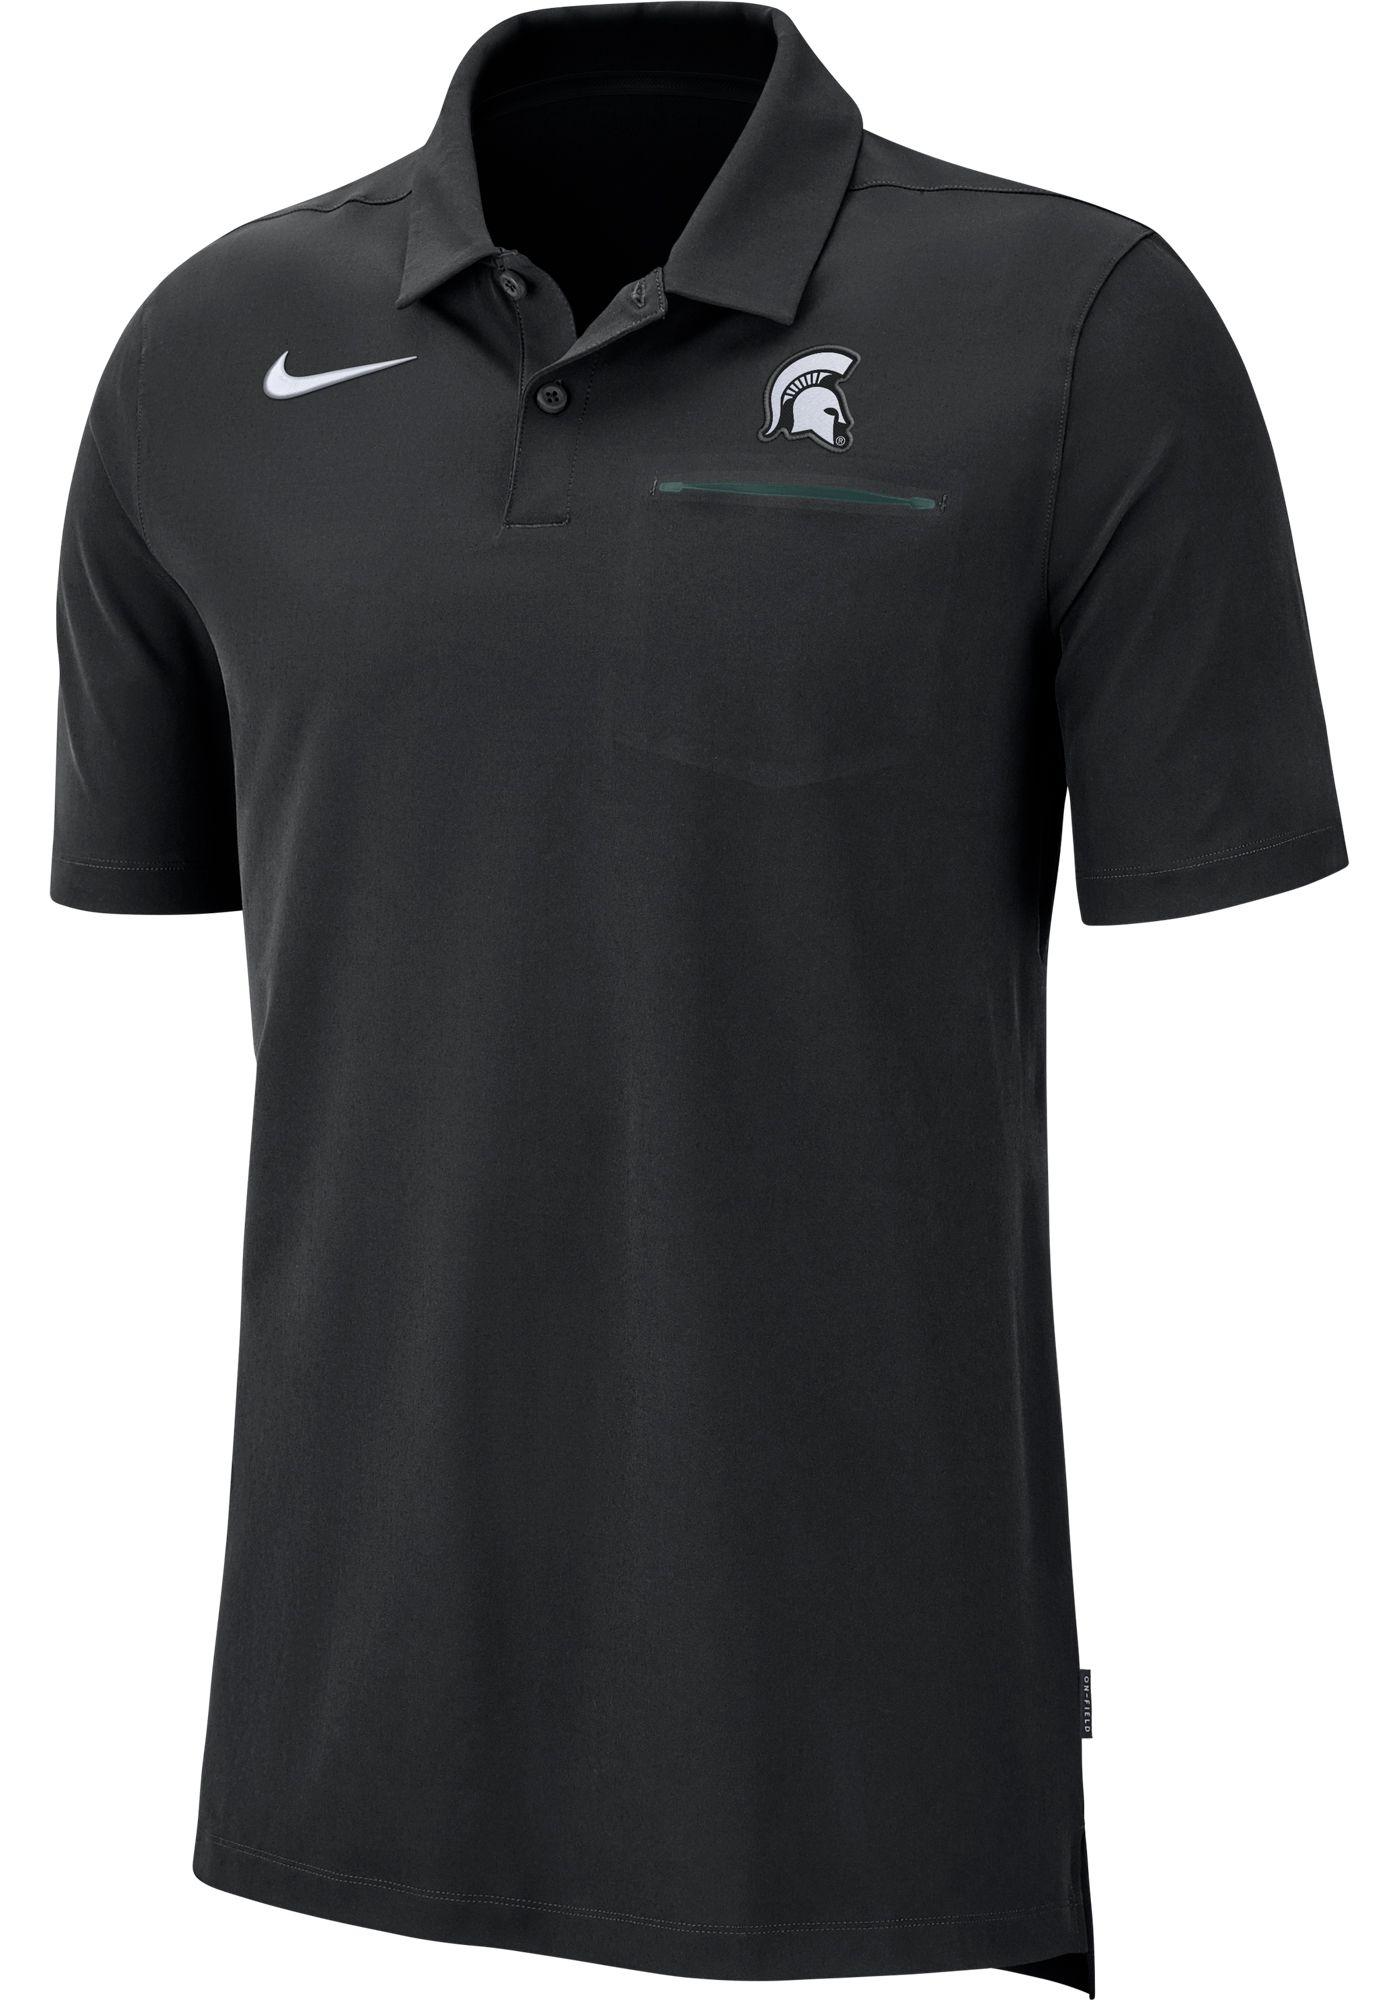 Nike Men's Michigan State Spartans Dri-FIT Elite Football Sideline Black Polo